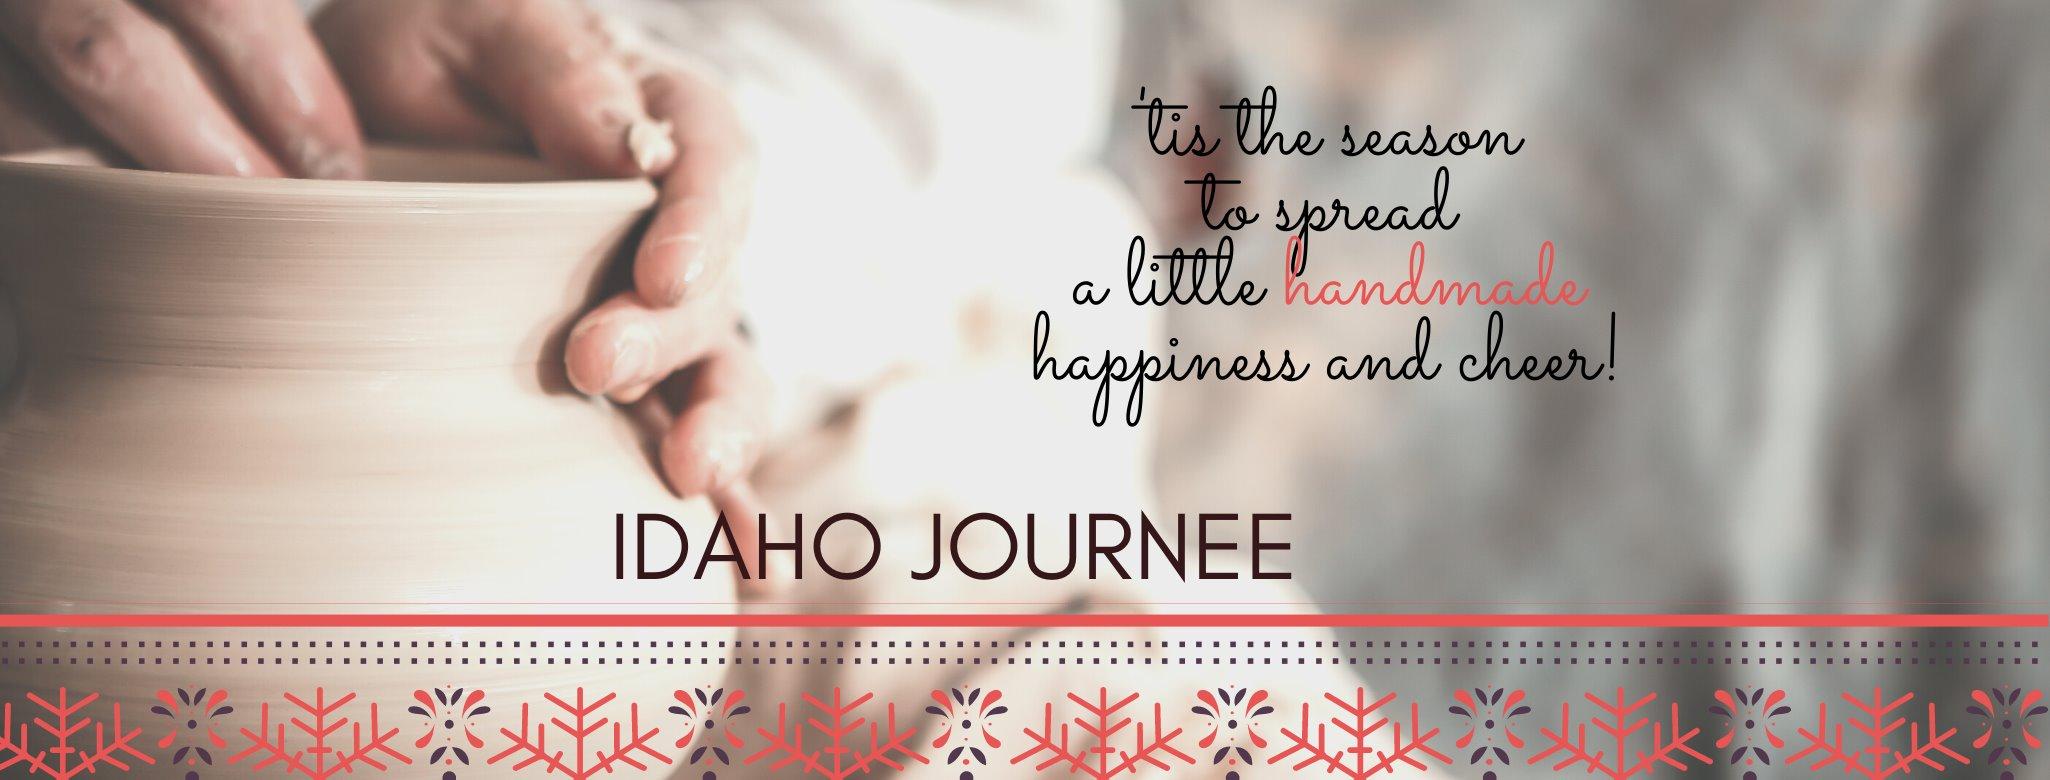 Idaho Journee – Handcrafted goods made in Idaho